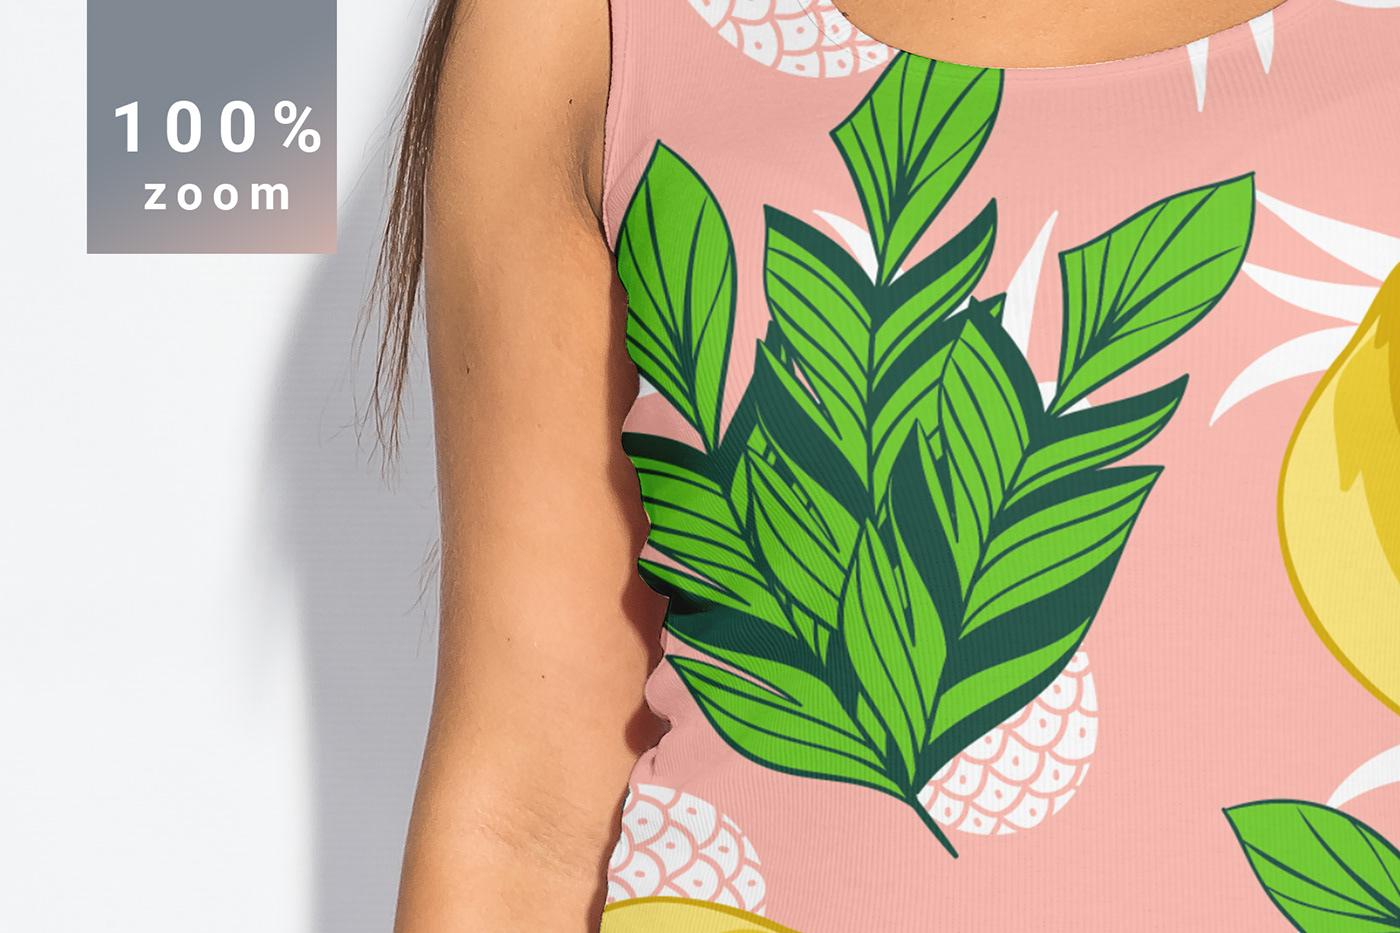 fashion mockup woman mockup free freebie free mockup  free download product mockup pattern design  fabric desogn cloth